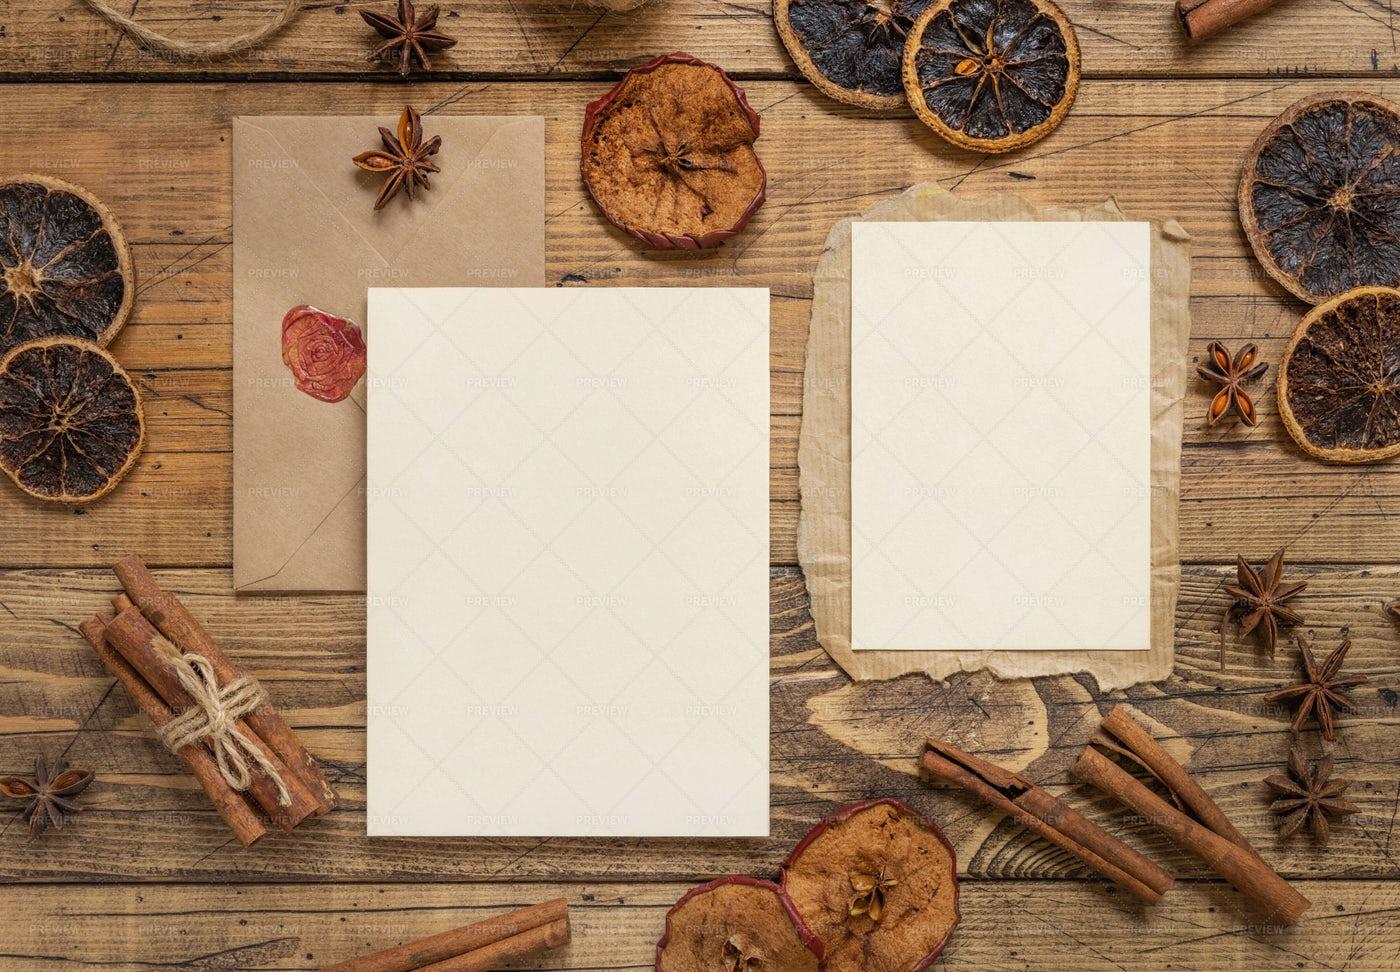 Rustic Christmas Cards: Stock Photos